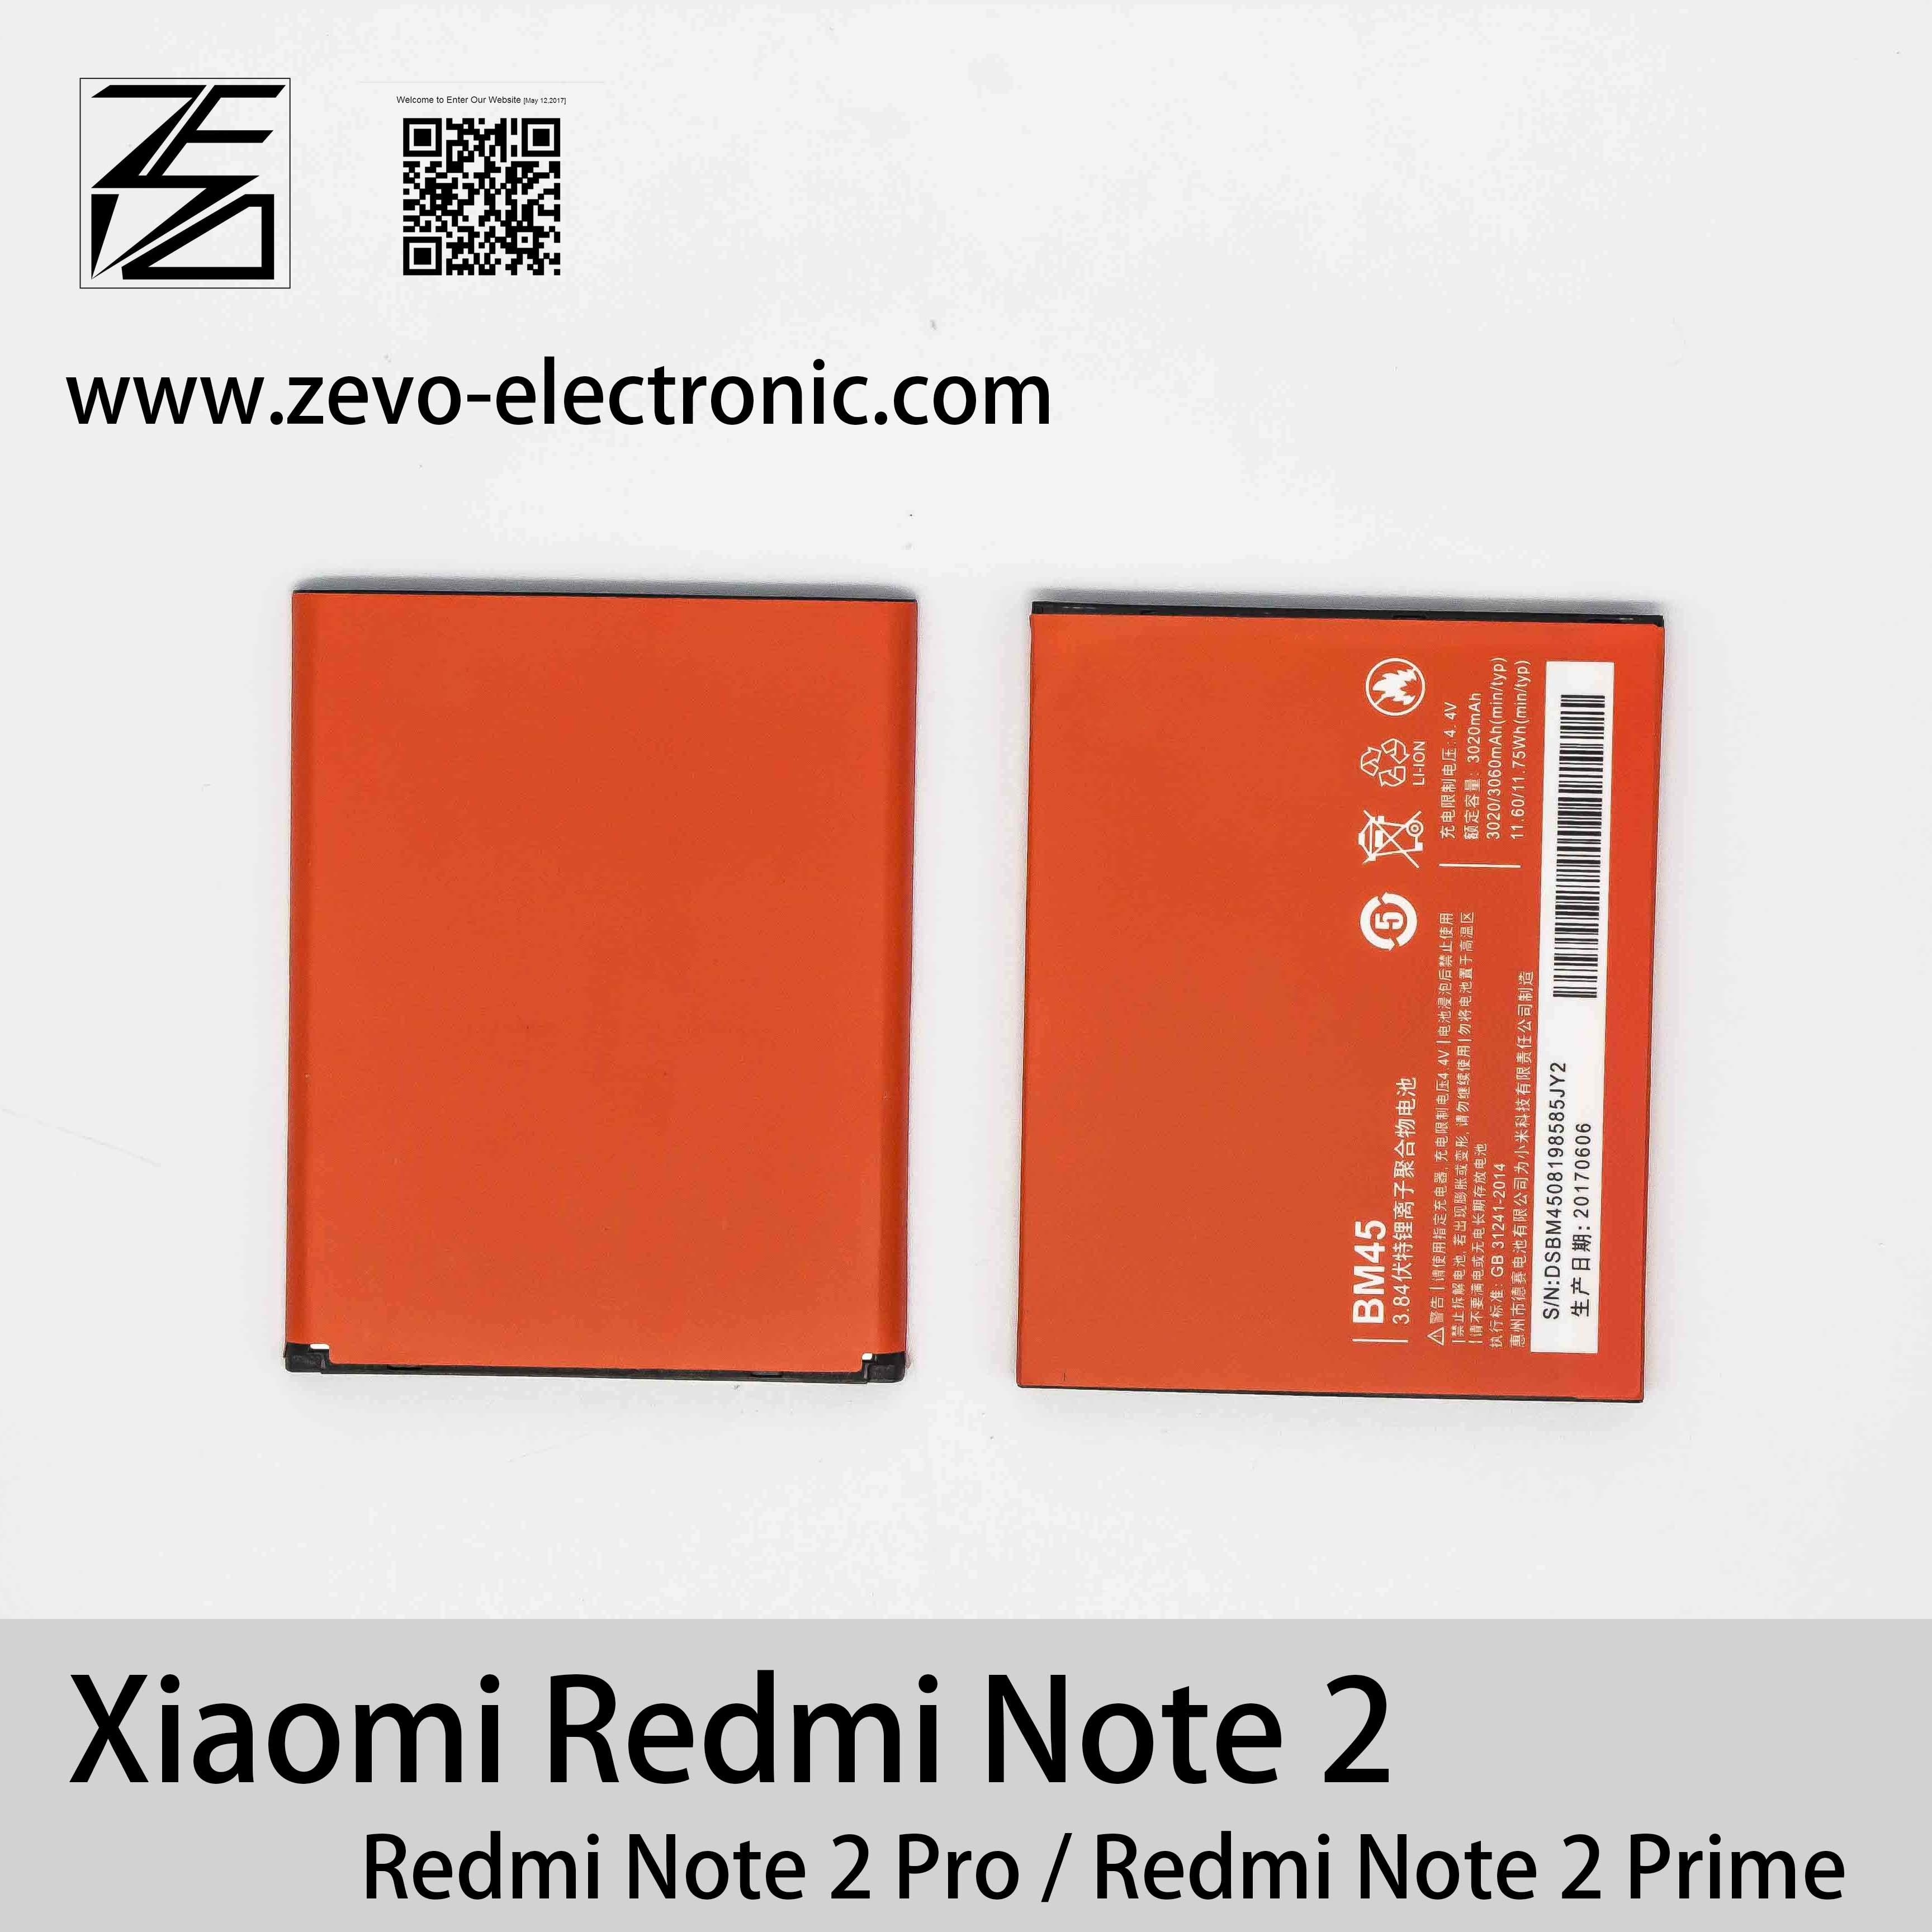 China 384v 3020mah 100 New Mobile Phone Battery Bm45 For Xiaomi Redmi Note 2 Prime Pro